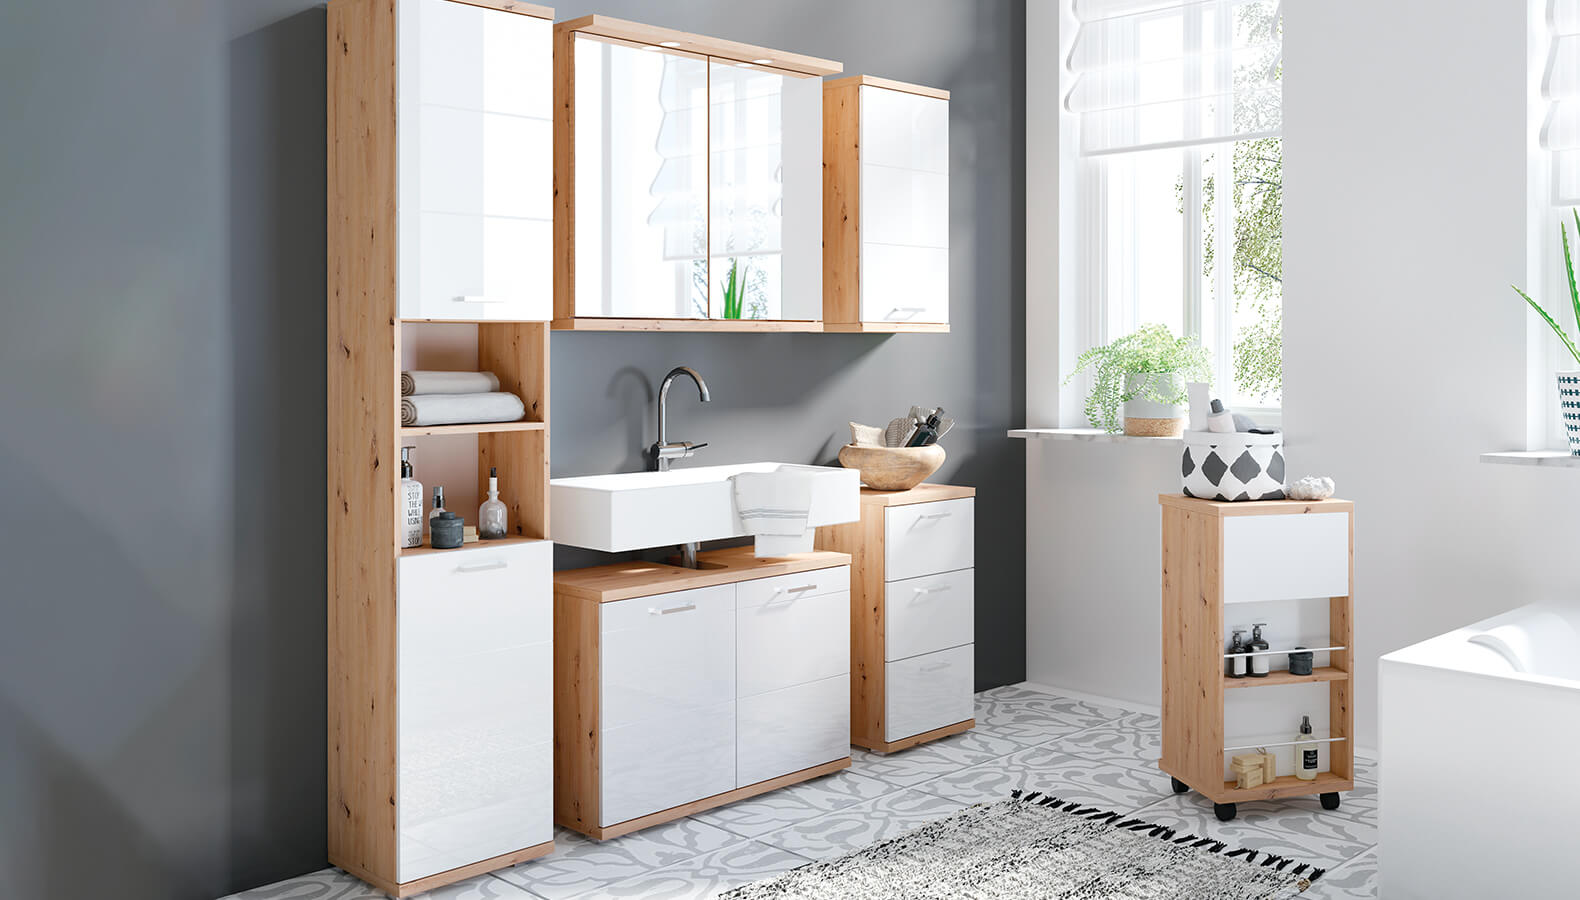 Badezimmer Sky Möbel mit echtem Trend Faktor   kika.at